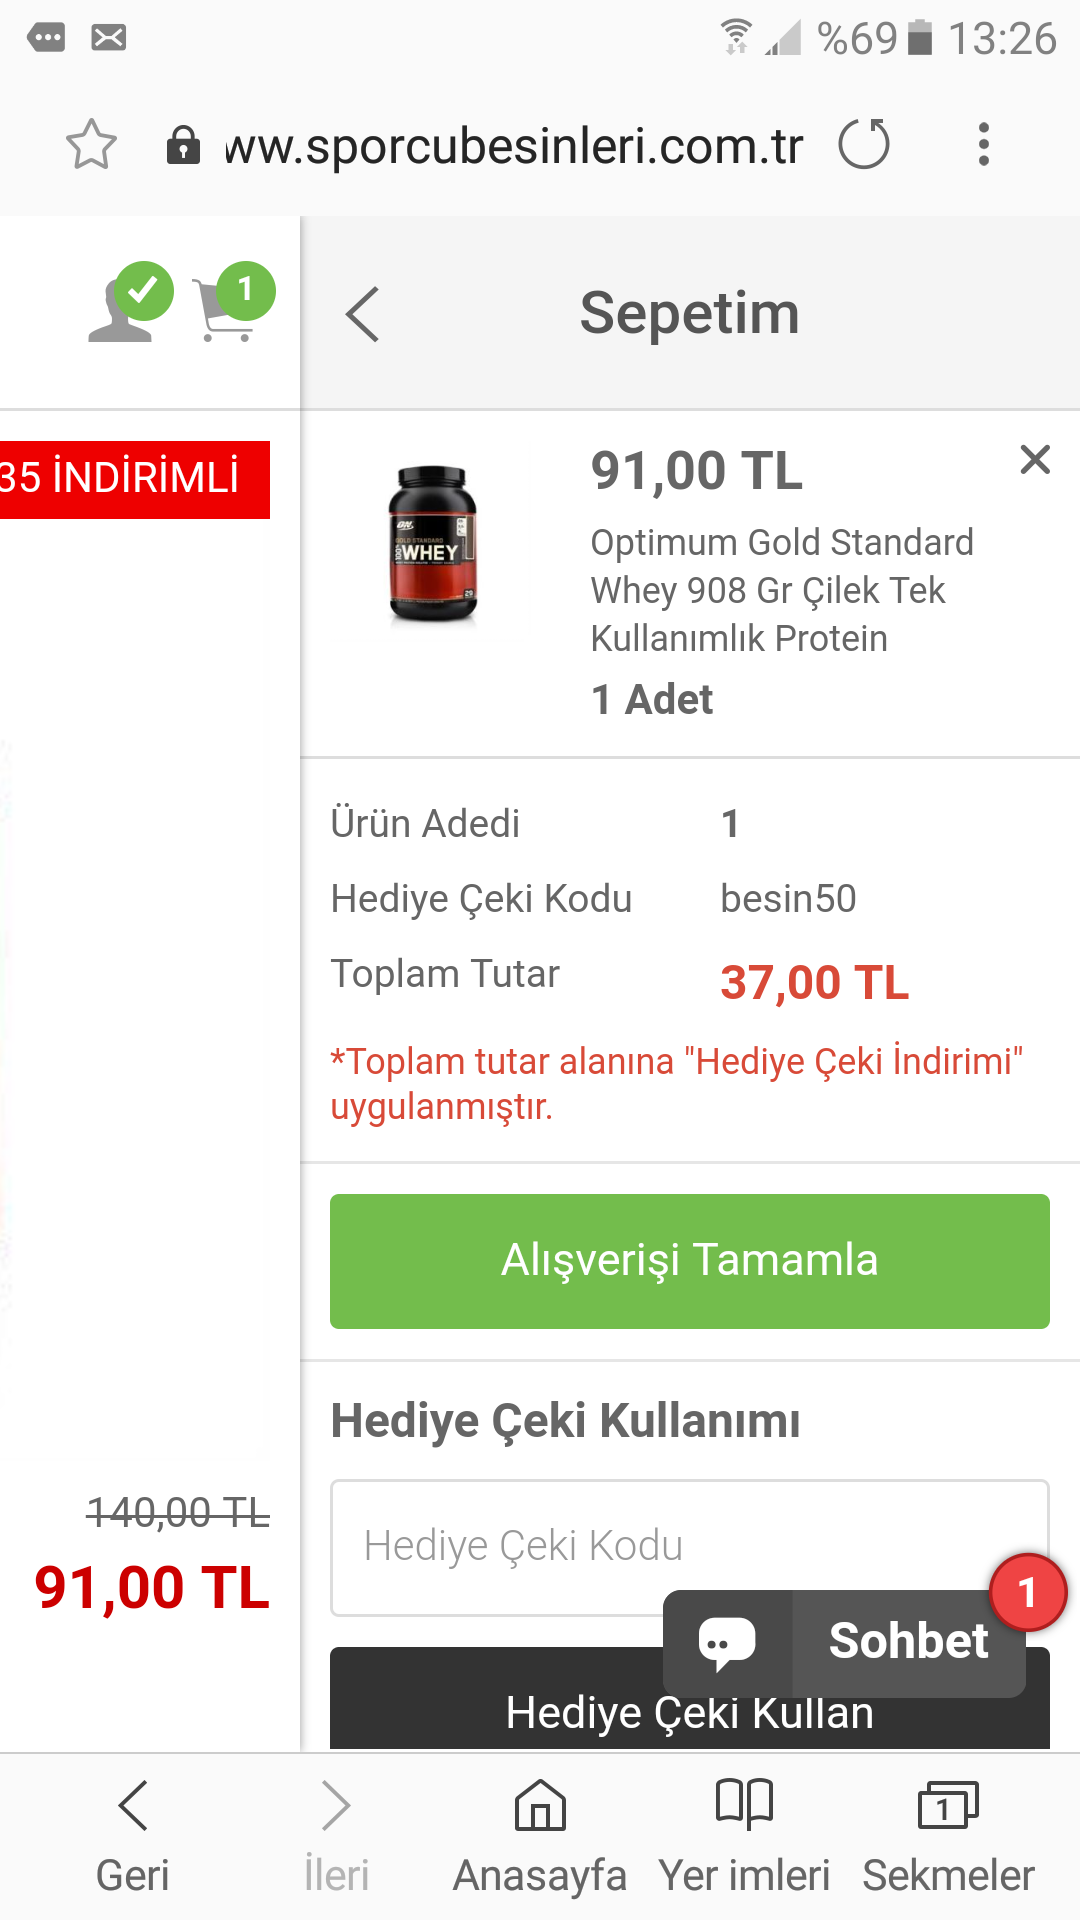 ncs coenzyme q10 alpha lipoic window pane lcarnitine 180 tablet